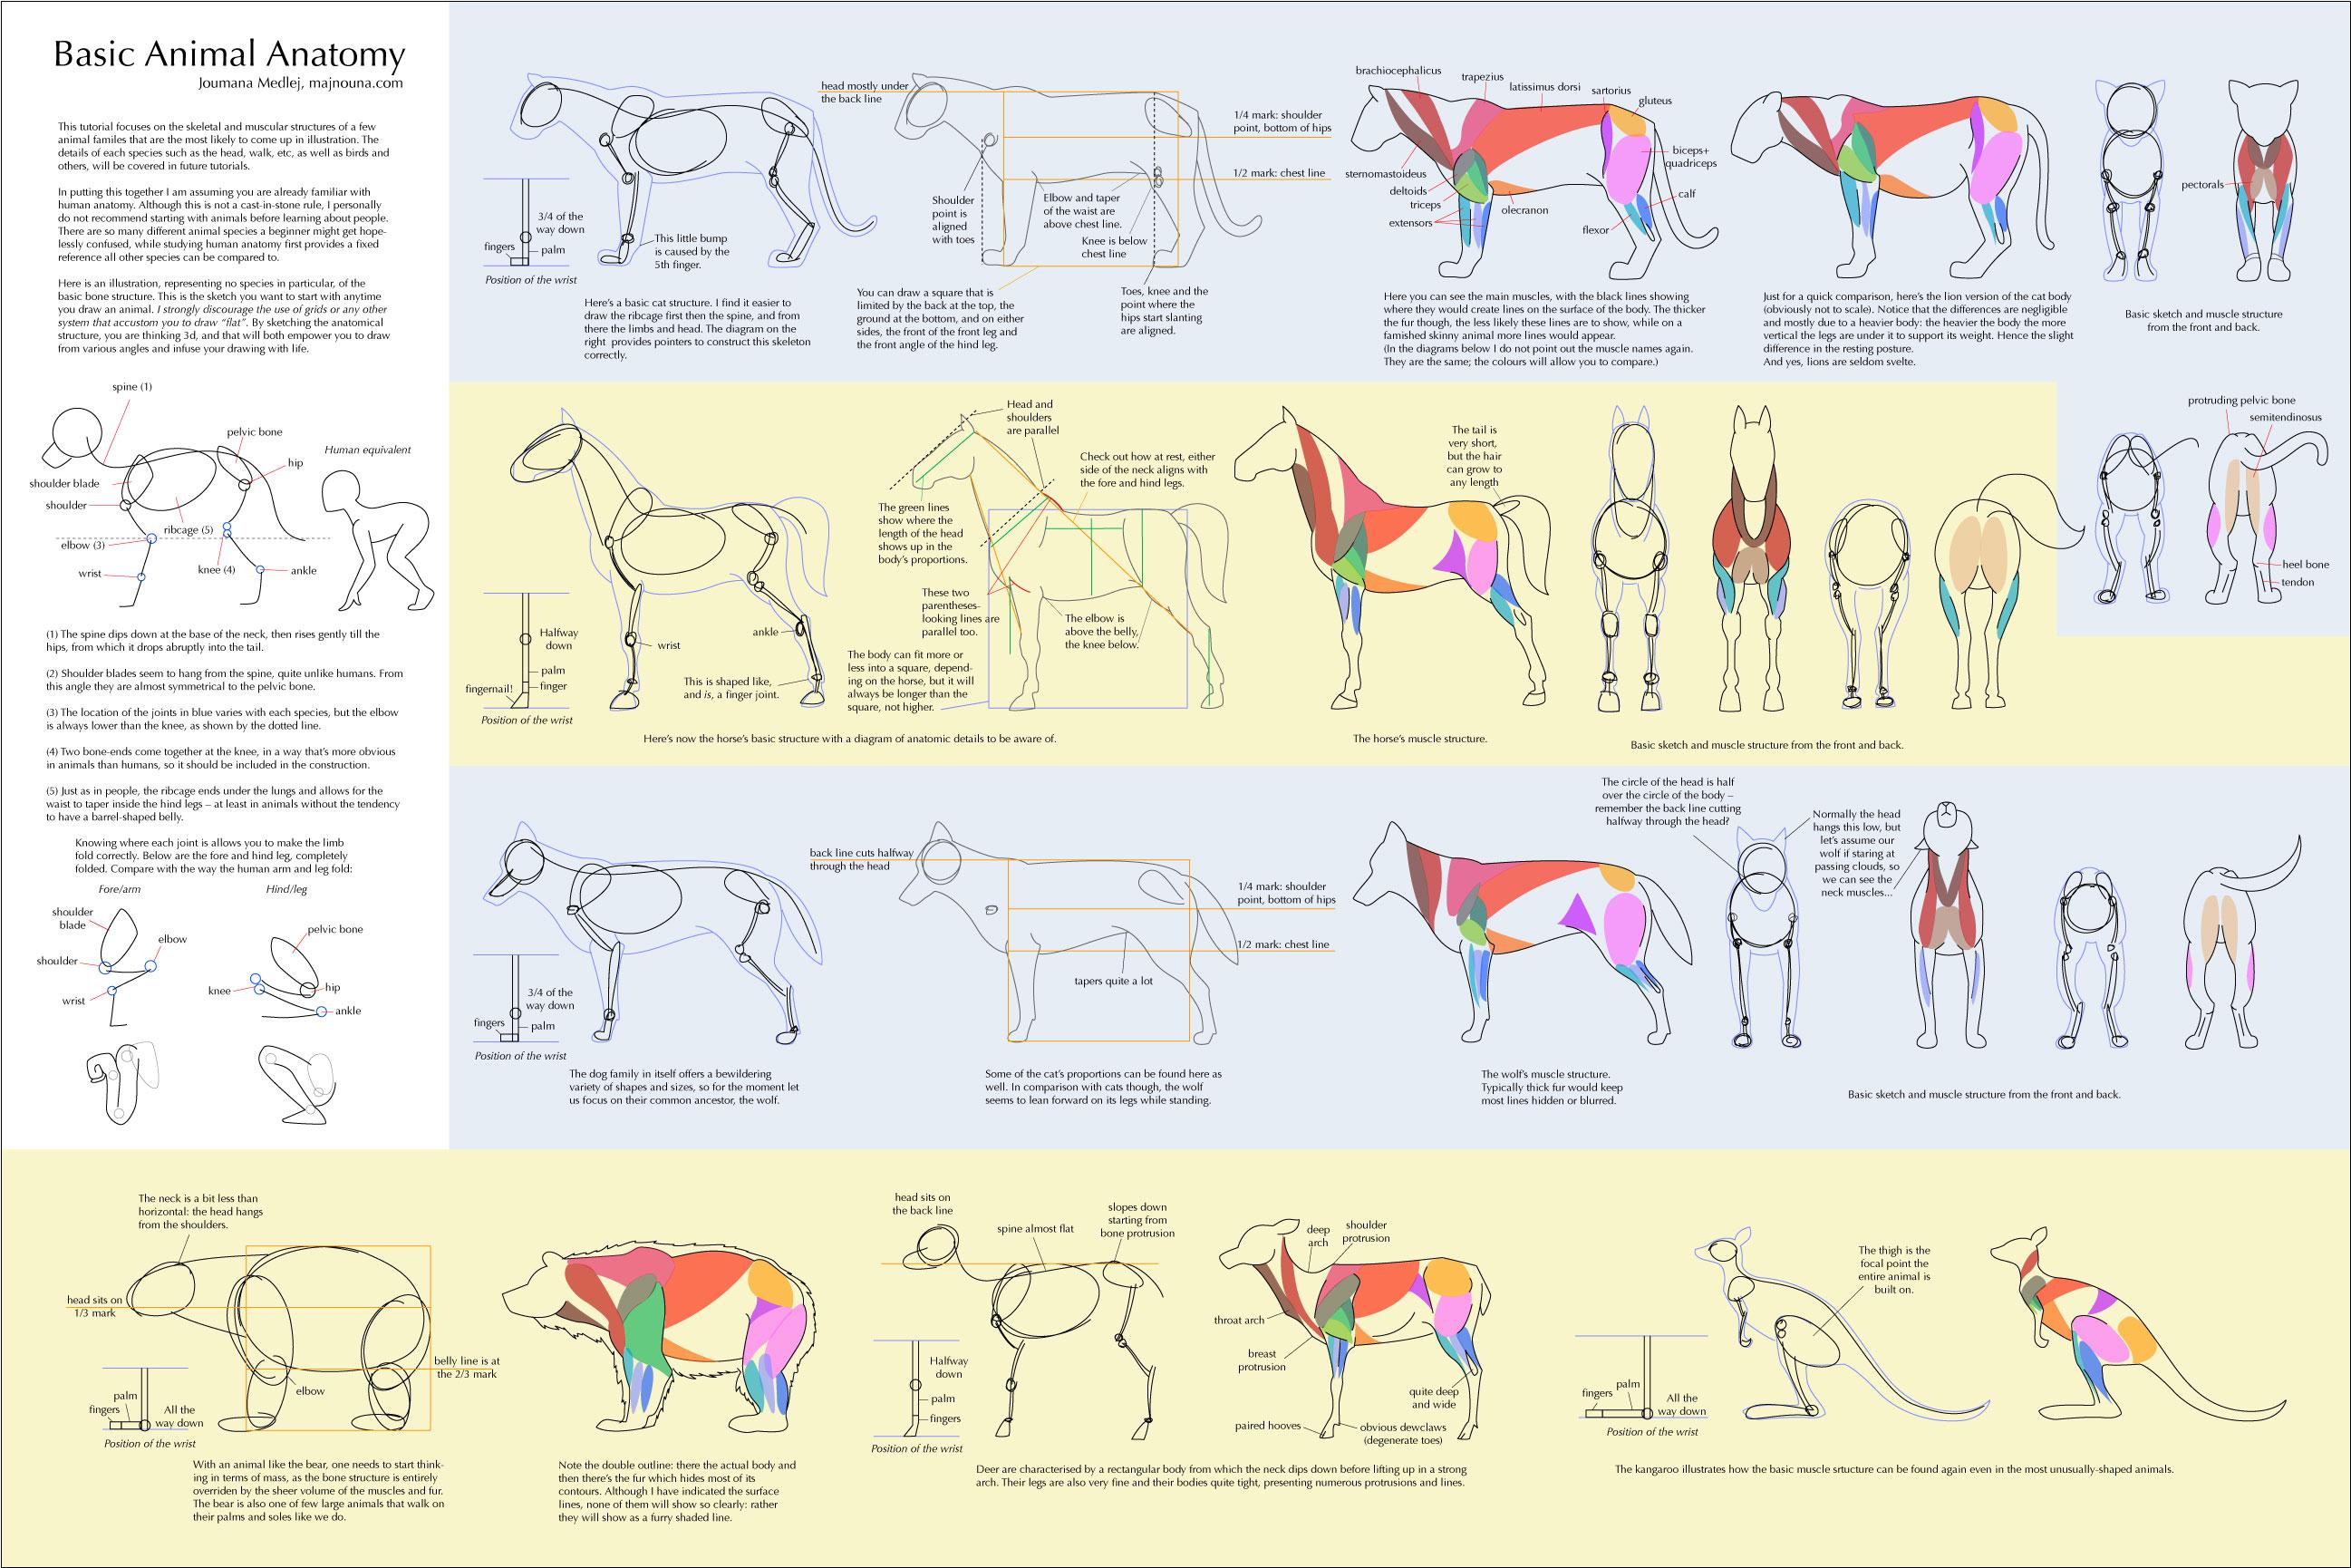 Basic Animal Anatomy by Majnouna